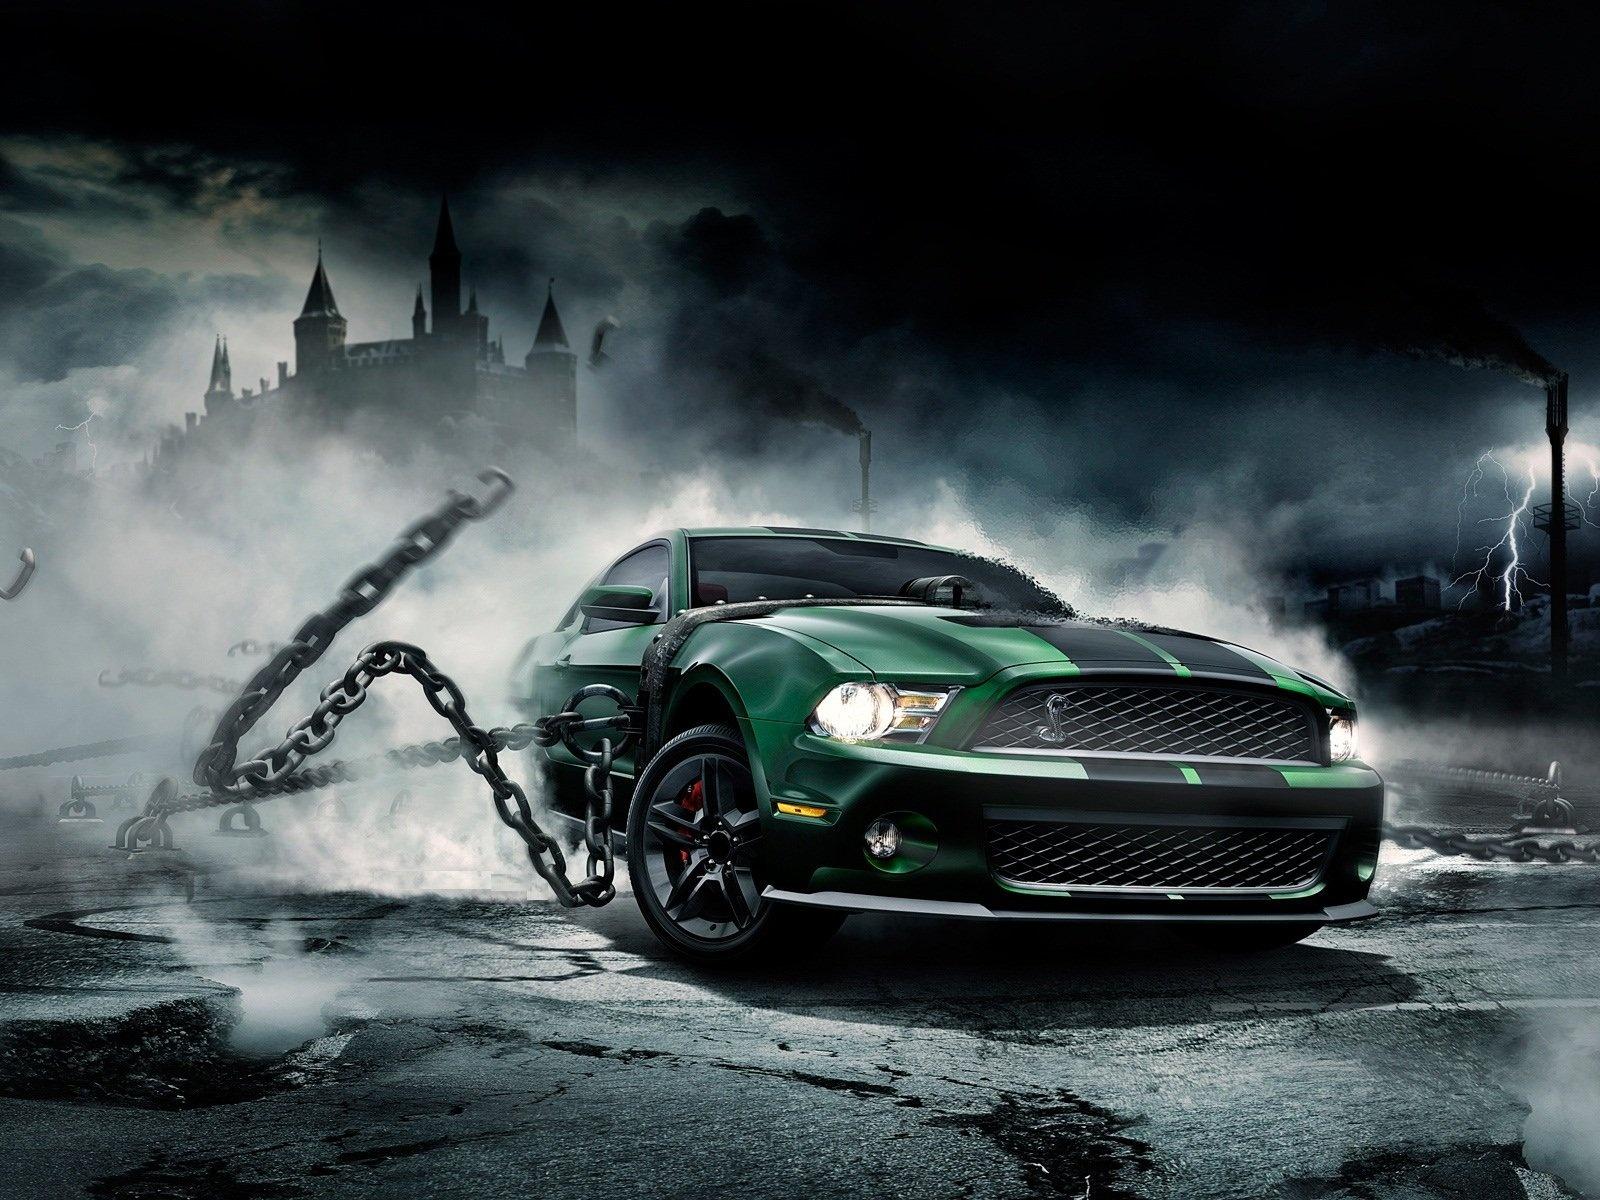 Cool Muscle Car Wallpaper 1600x1200